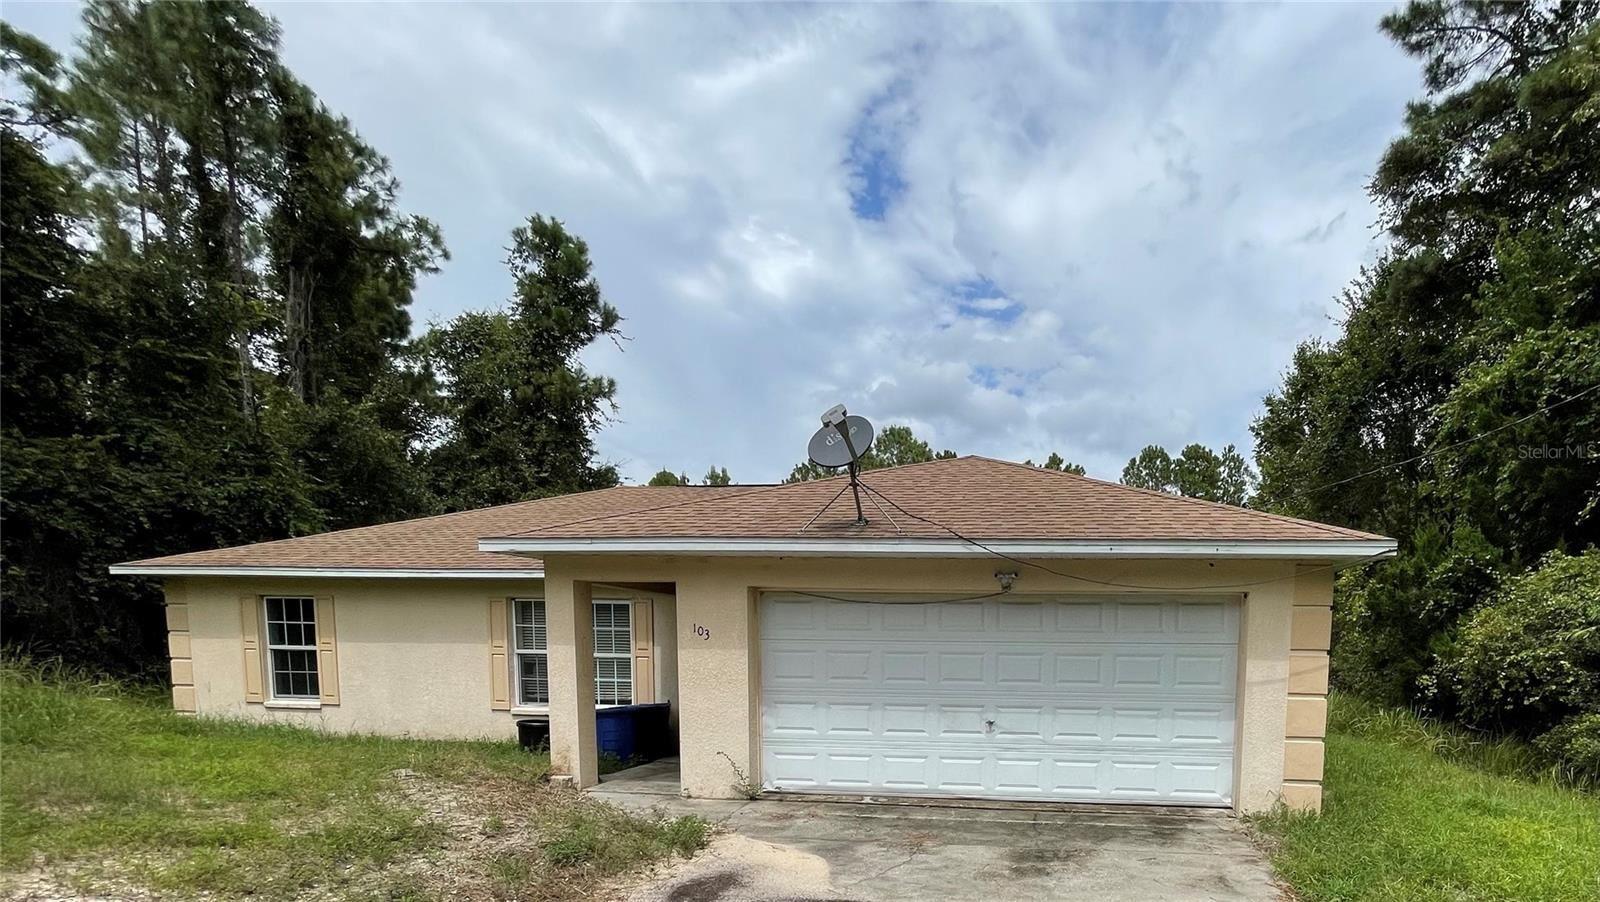 103 LOCUST LOOP, Ocala, FL 34472 - MLS#: O5968129